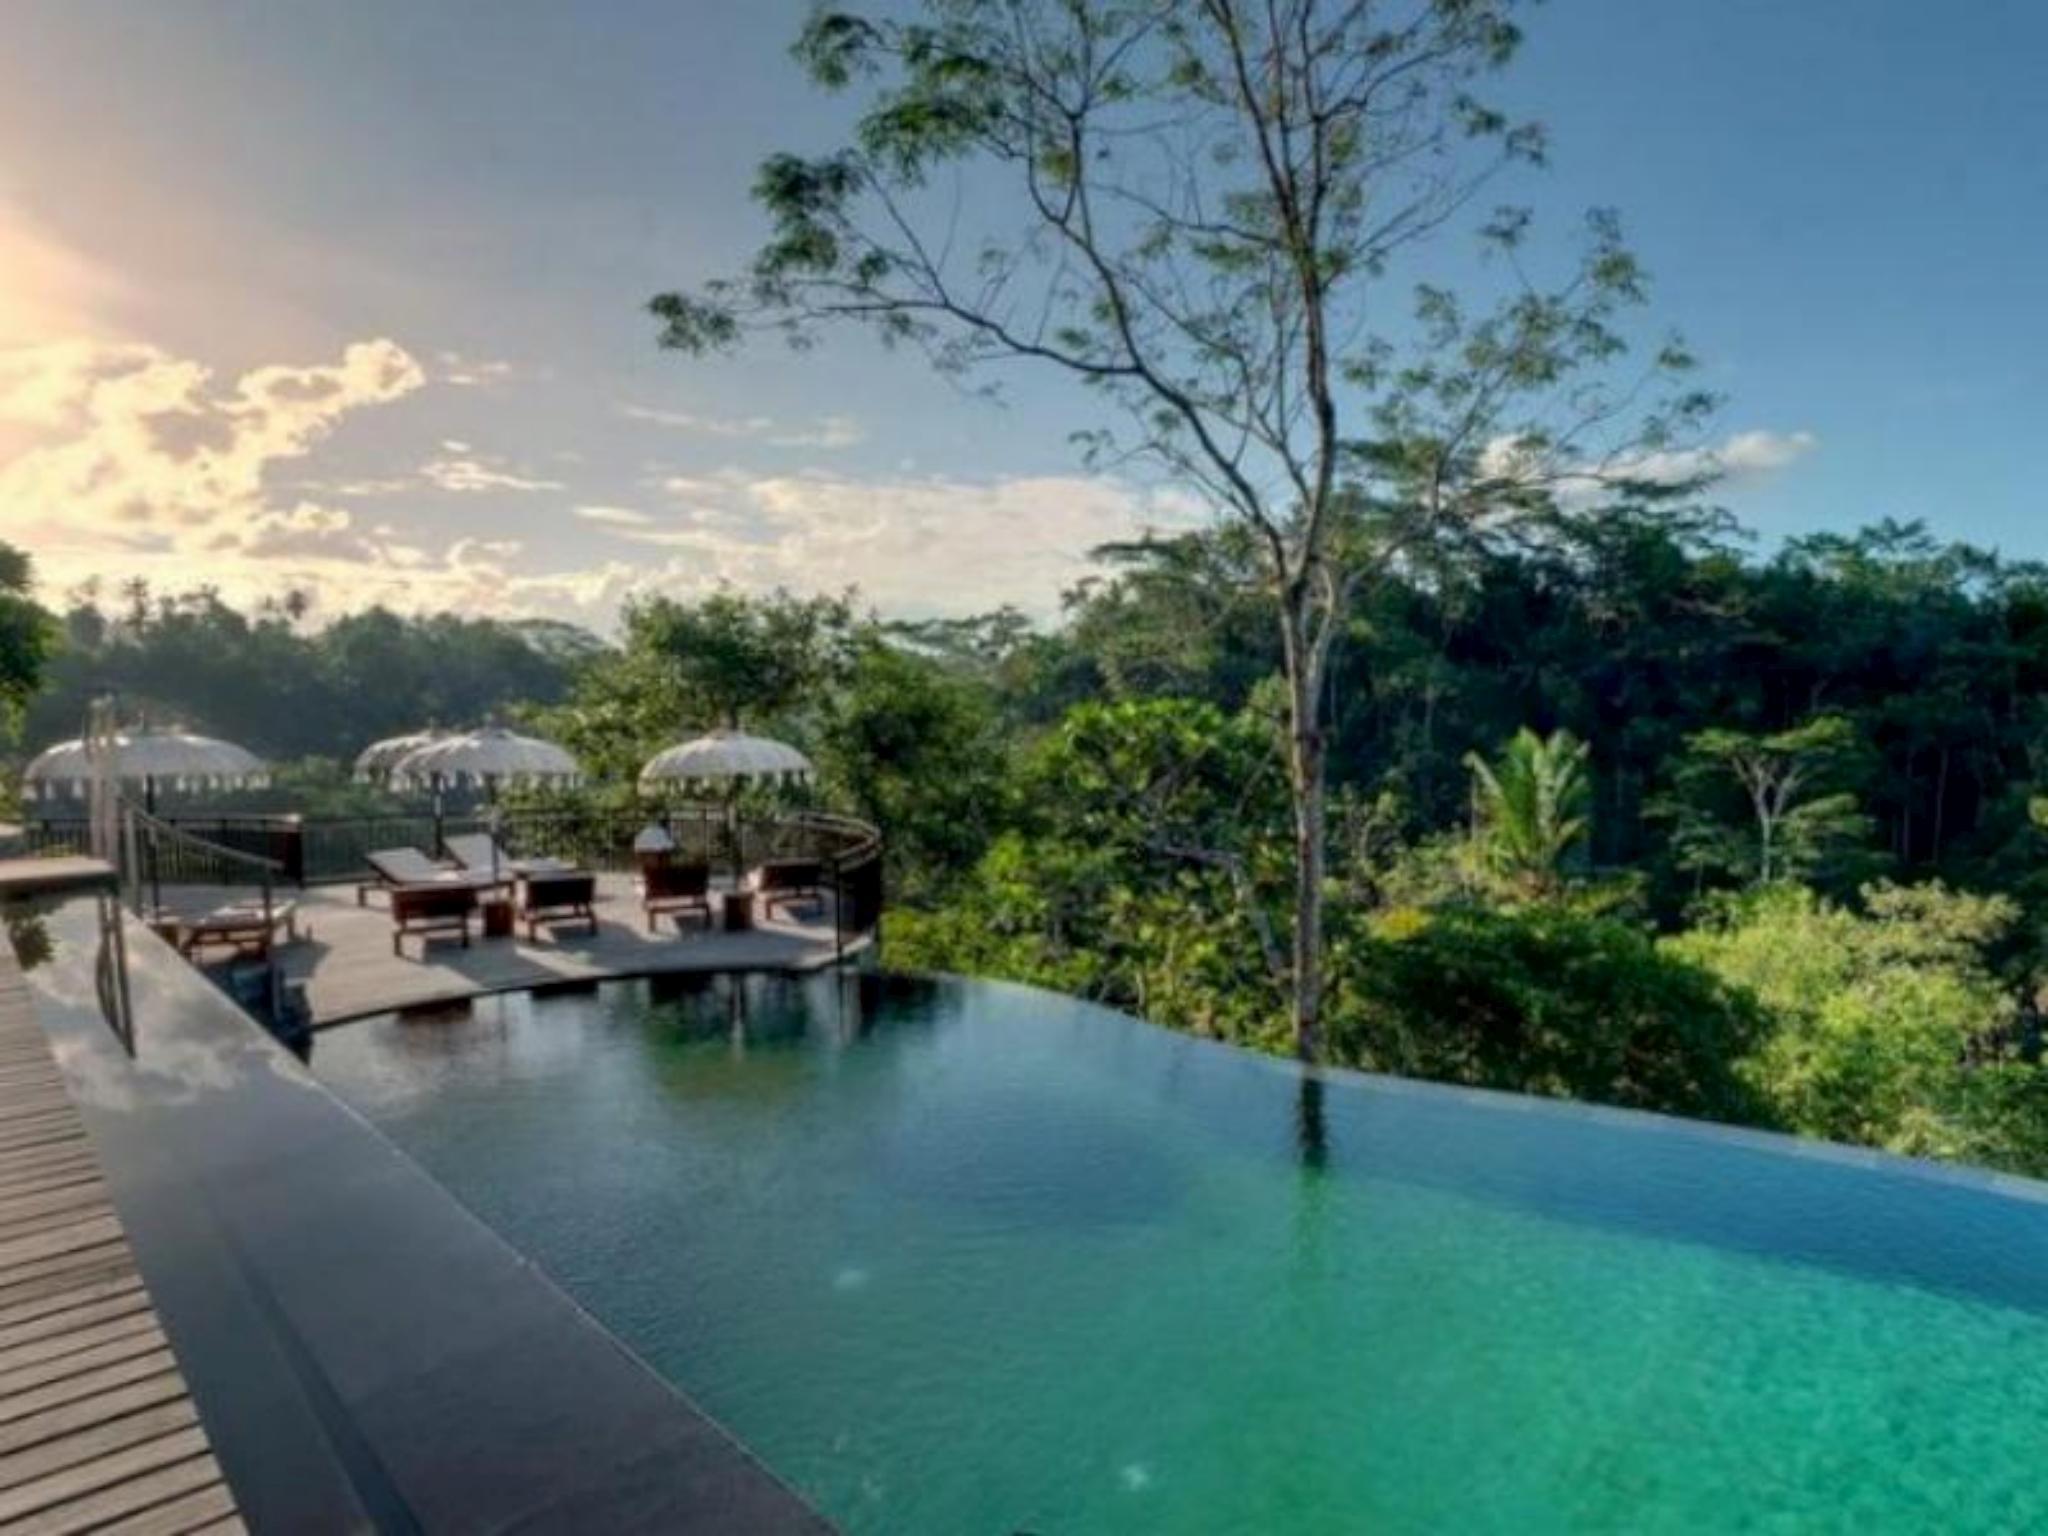 Home Asia Indonesia Bali Ubud Ubud Hotels